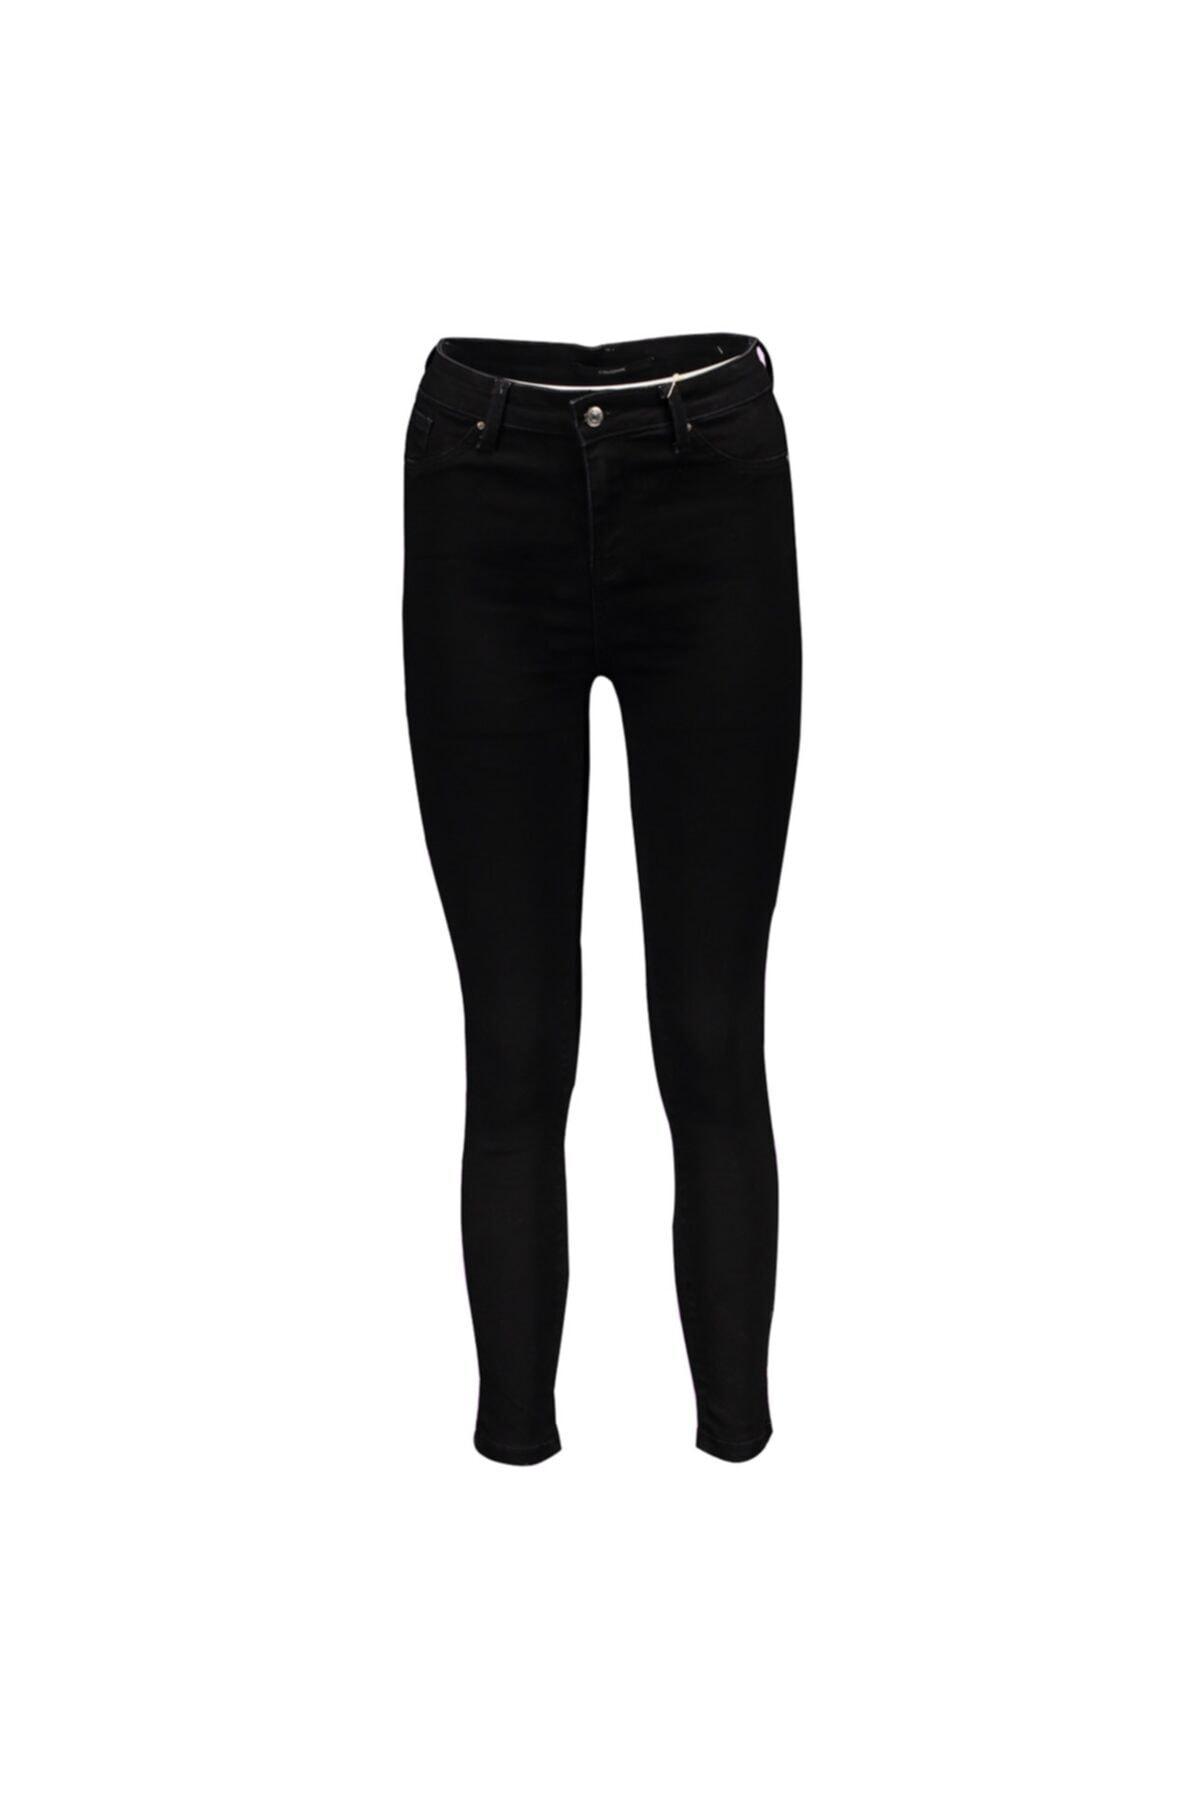 Collezione Sıyah Kadın Pantolon 2